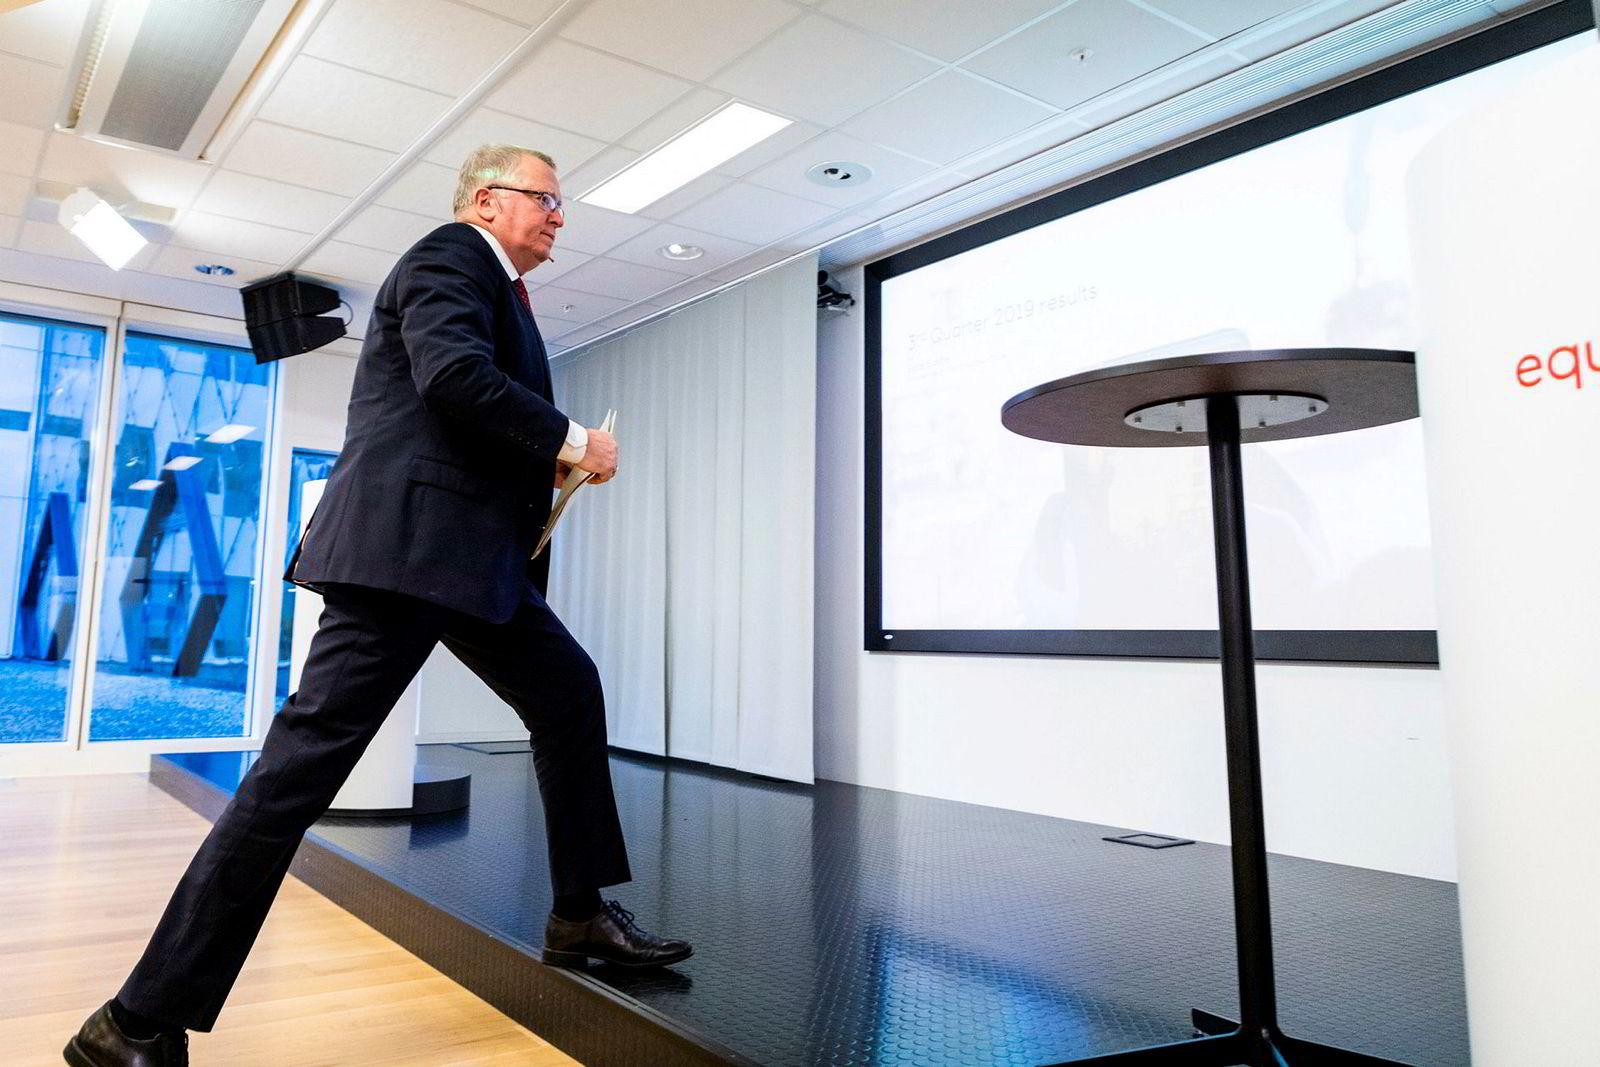 Konsernsjef Eldar Sætre presenterte torsdag morgen kvartalsresultatet i Equinors lokaler på Fornebu.